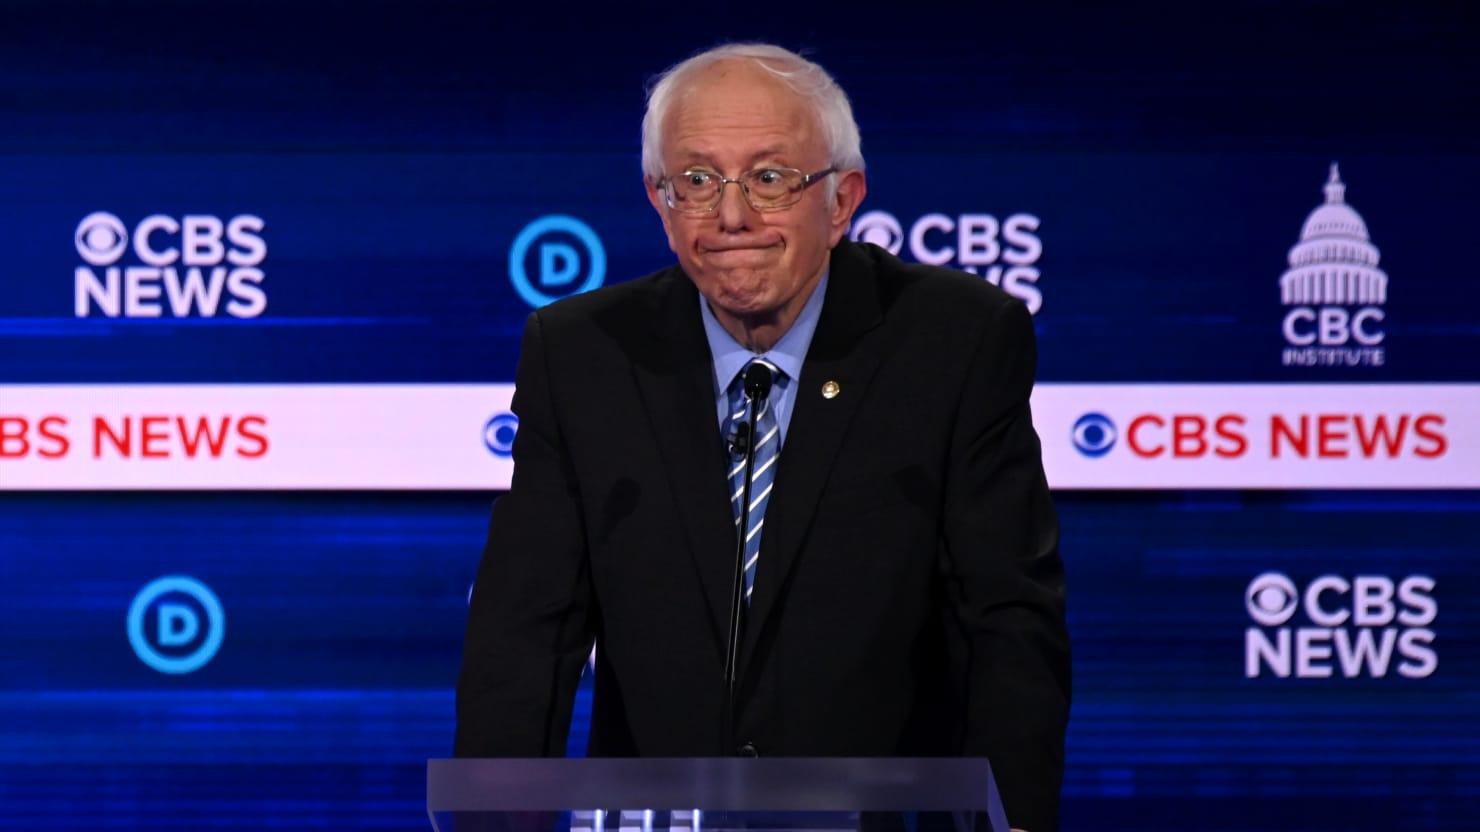 Democratic Debate: The Entire Field Piles on Bernie